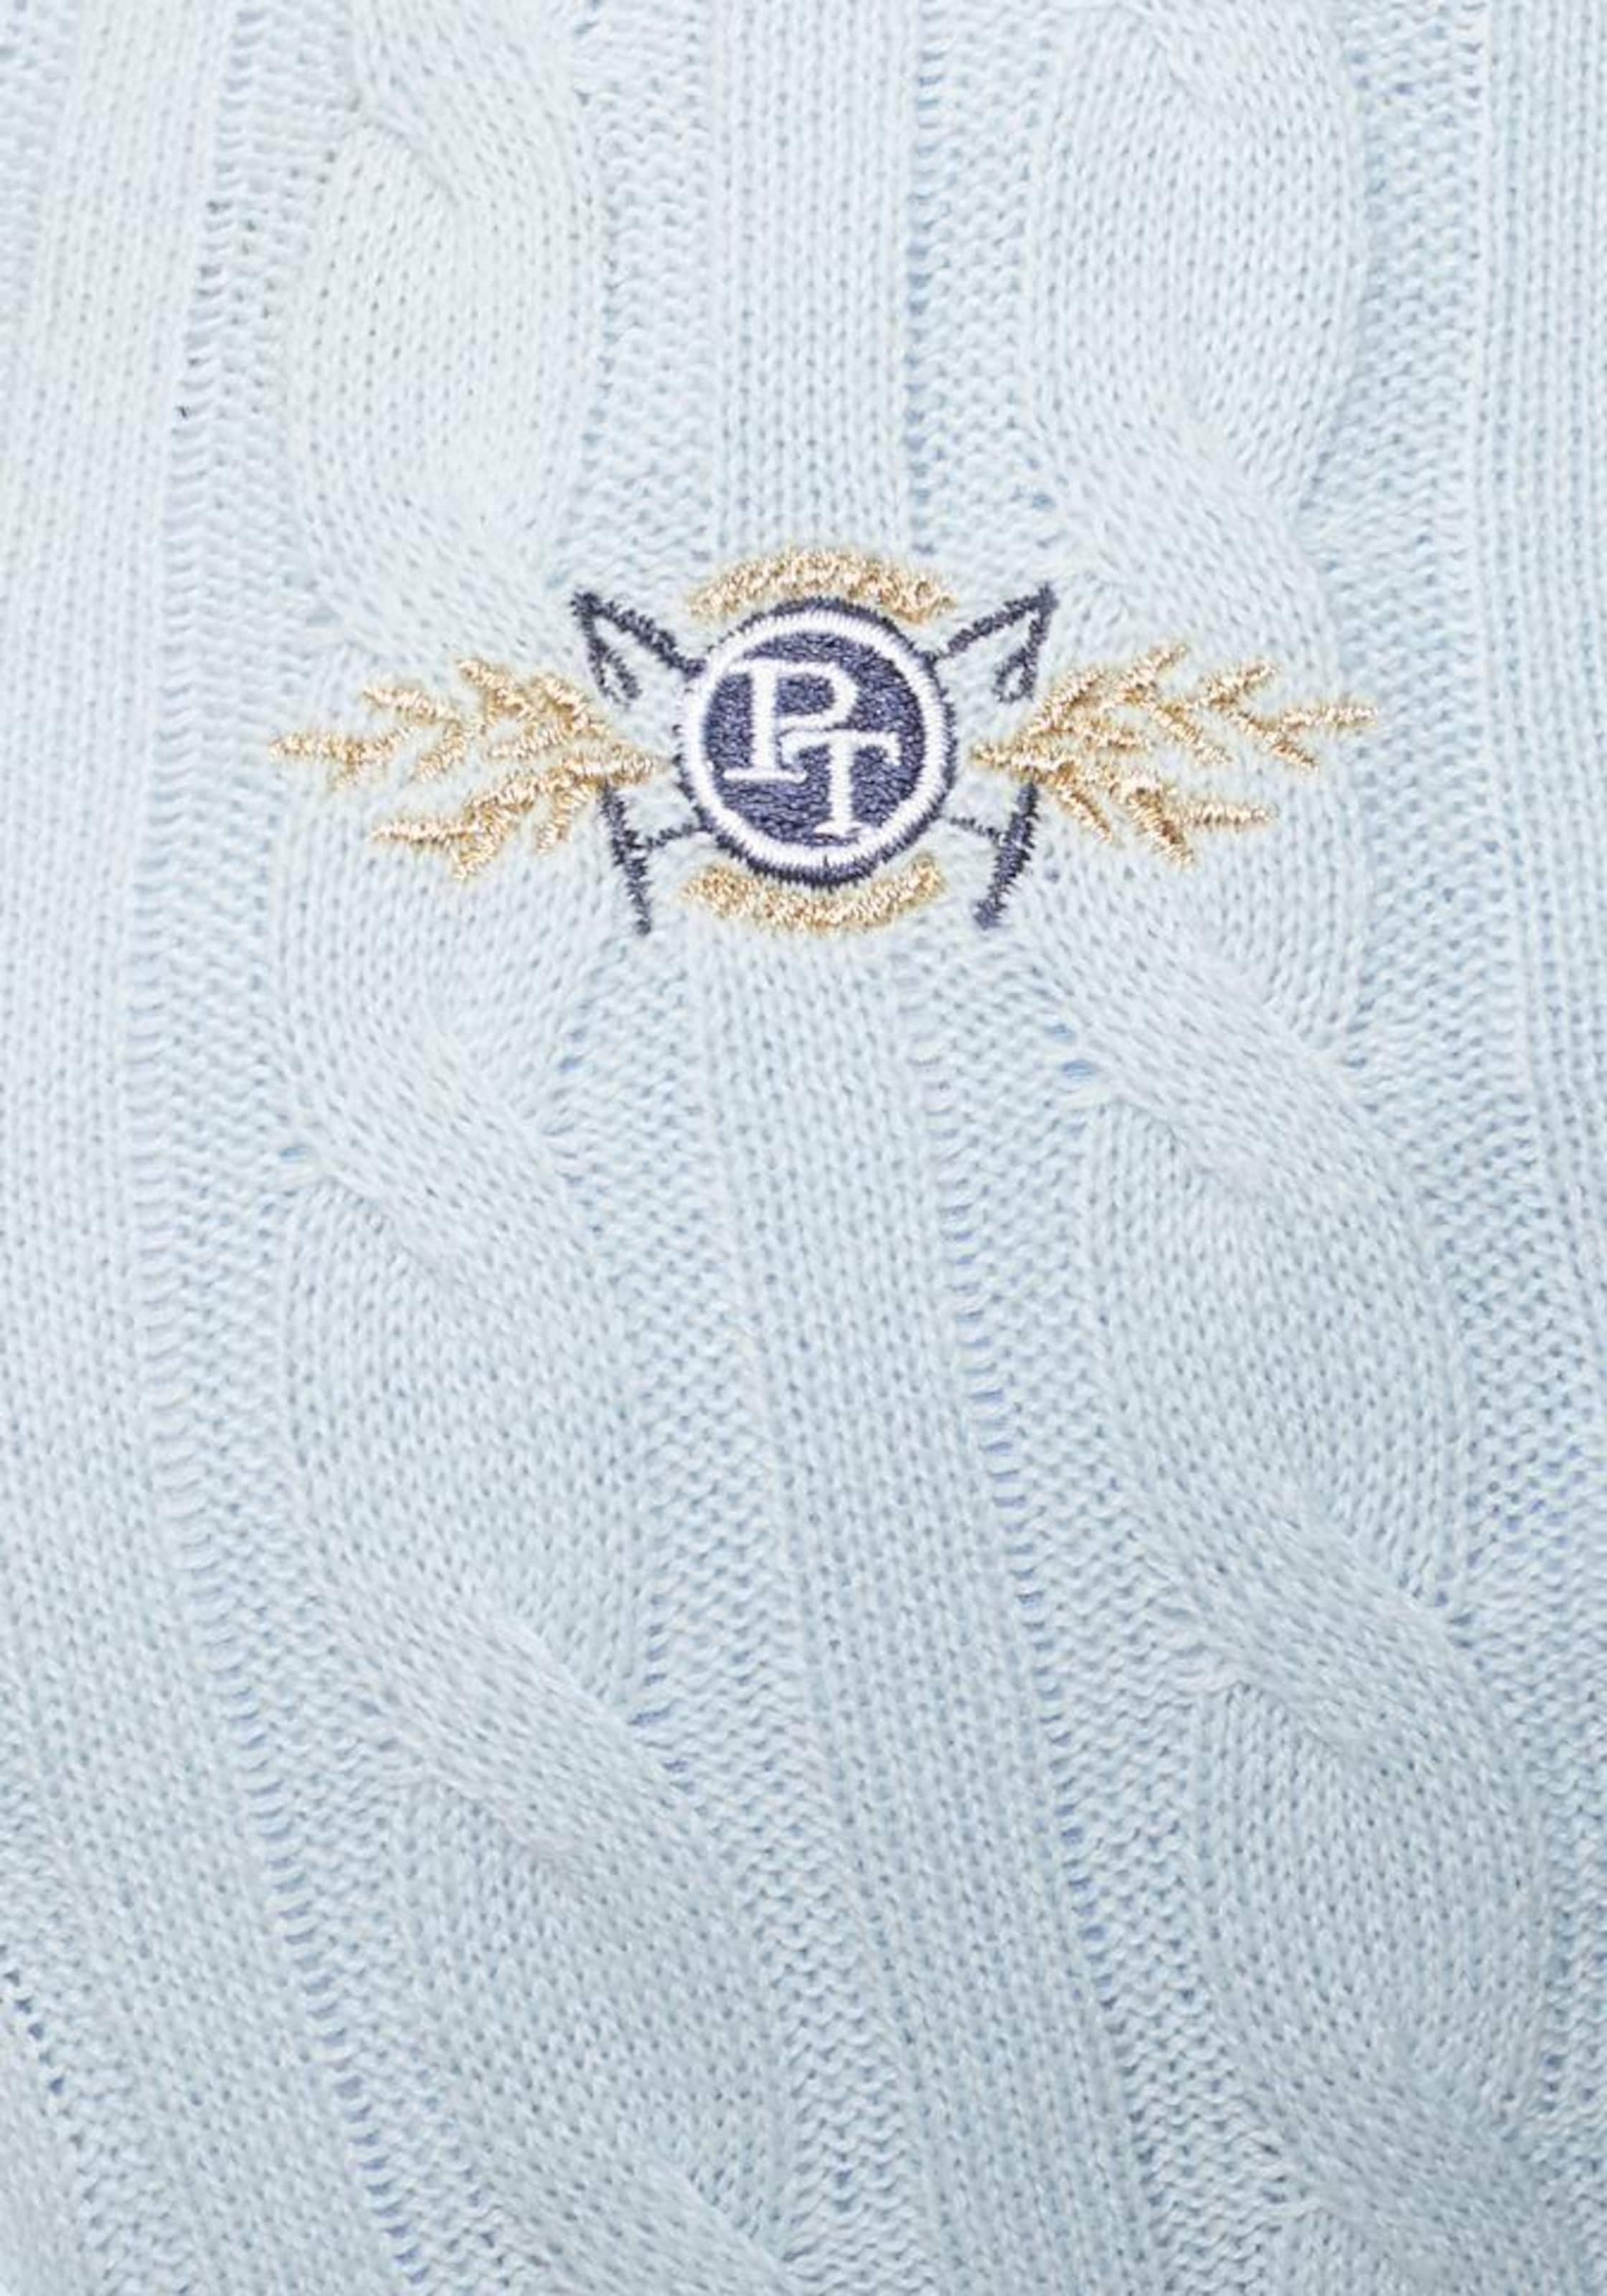 Pullover Hellblau Tailor In Tom Polo Team eWH9EI2DY